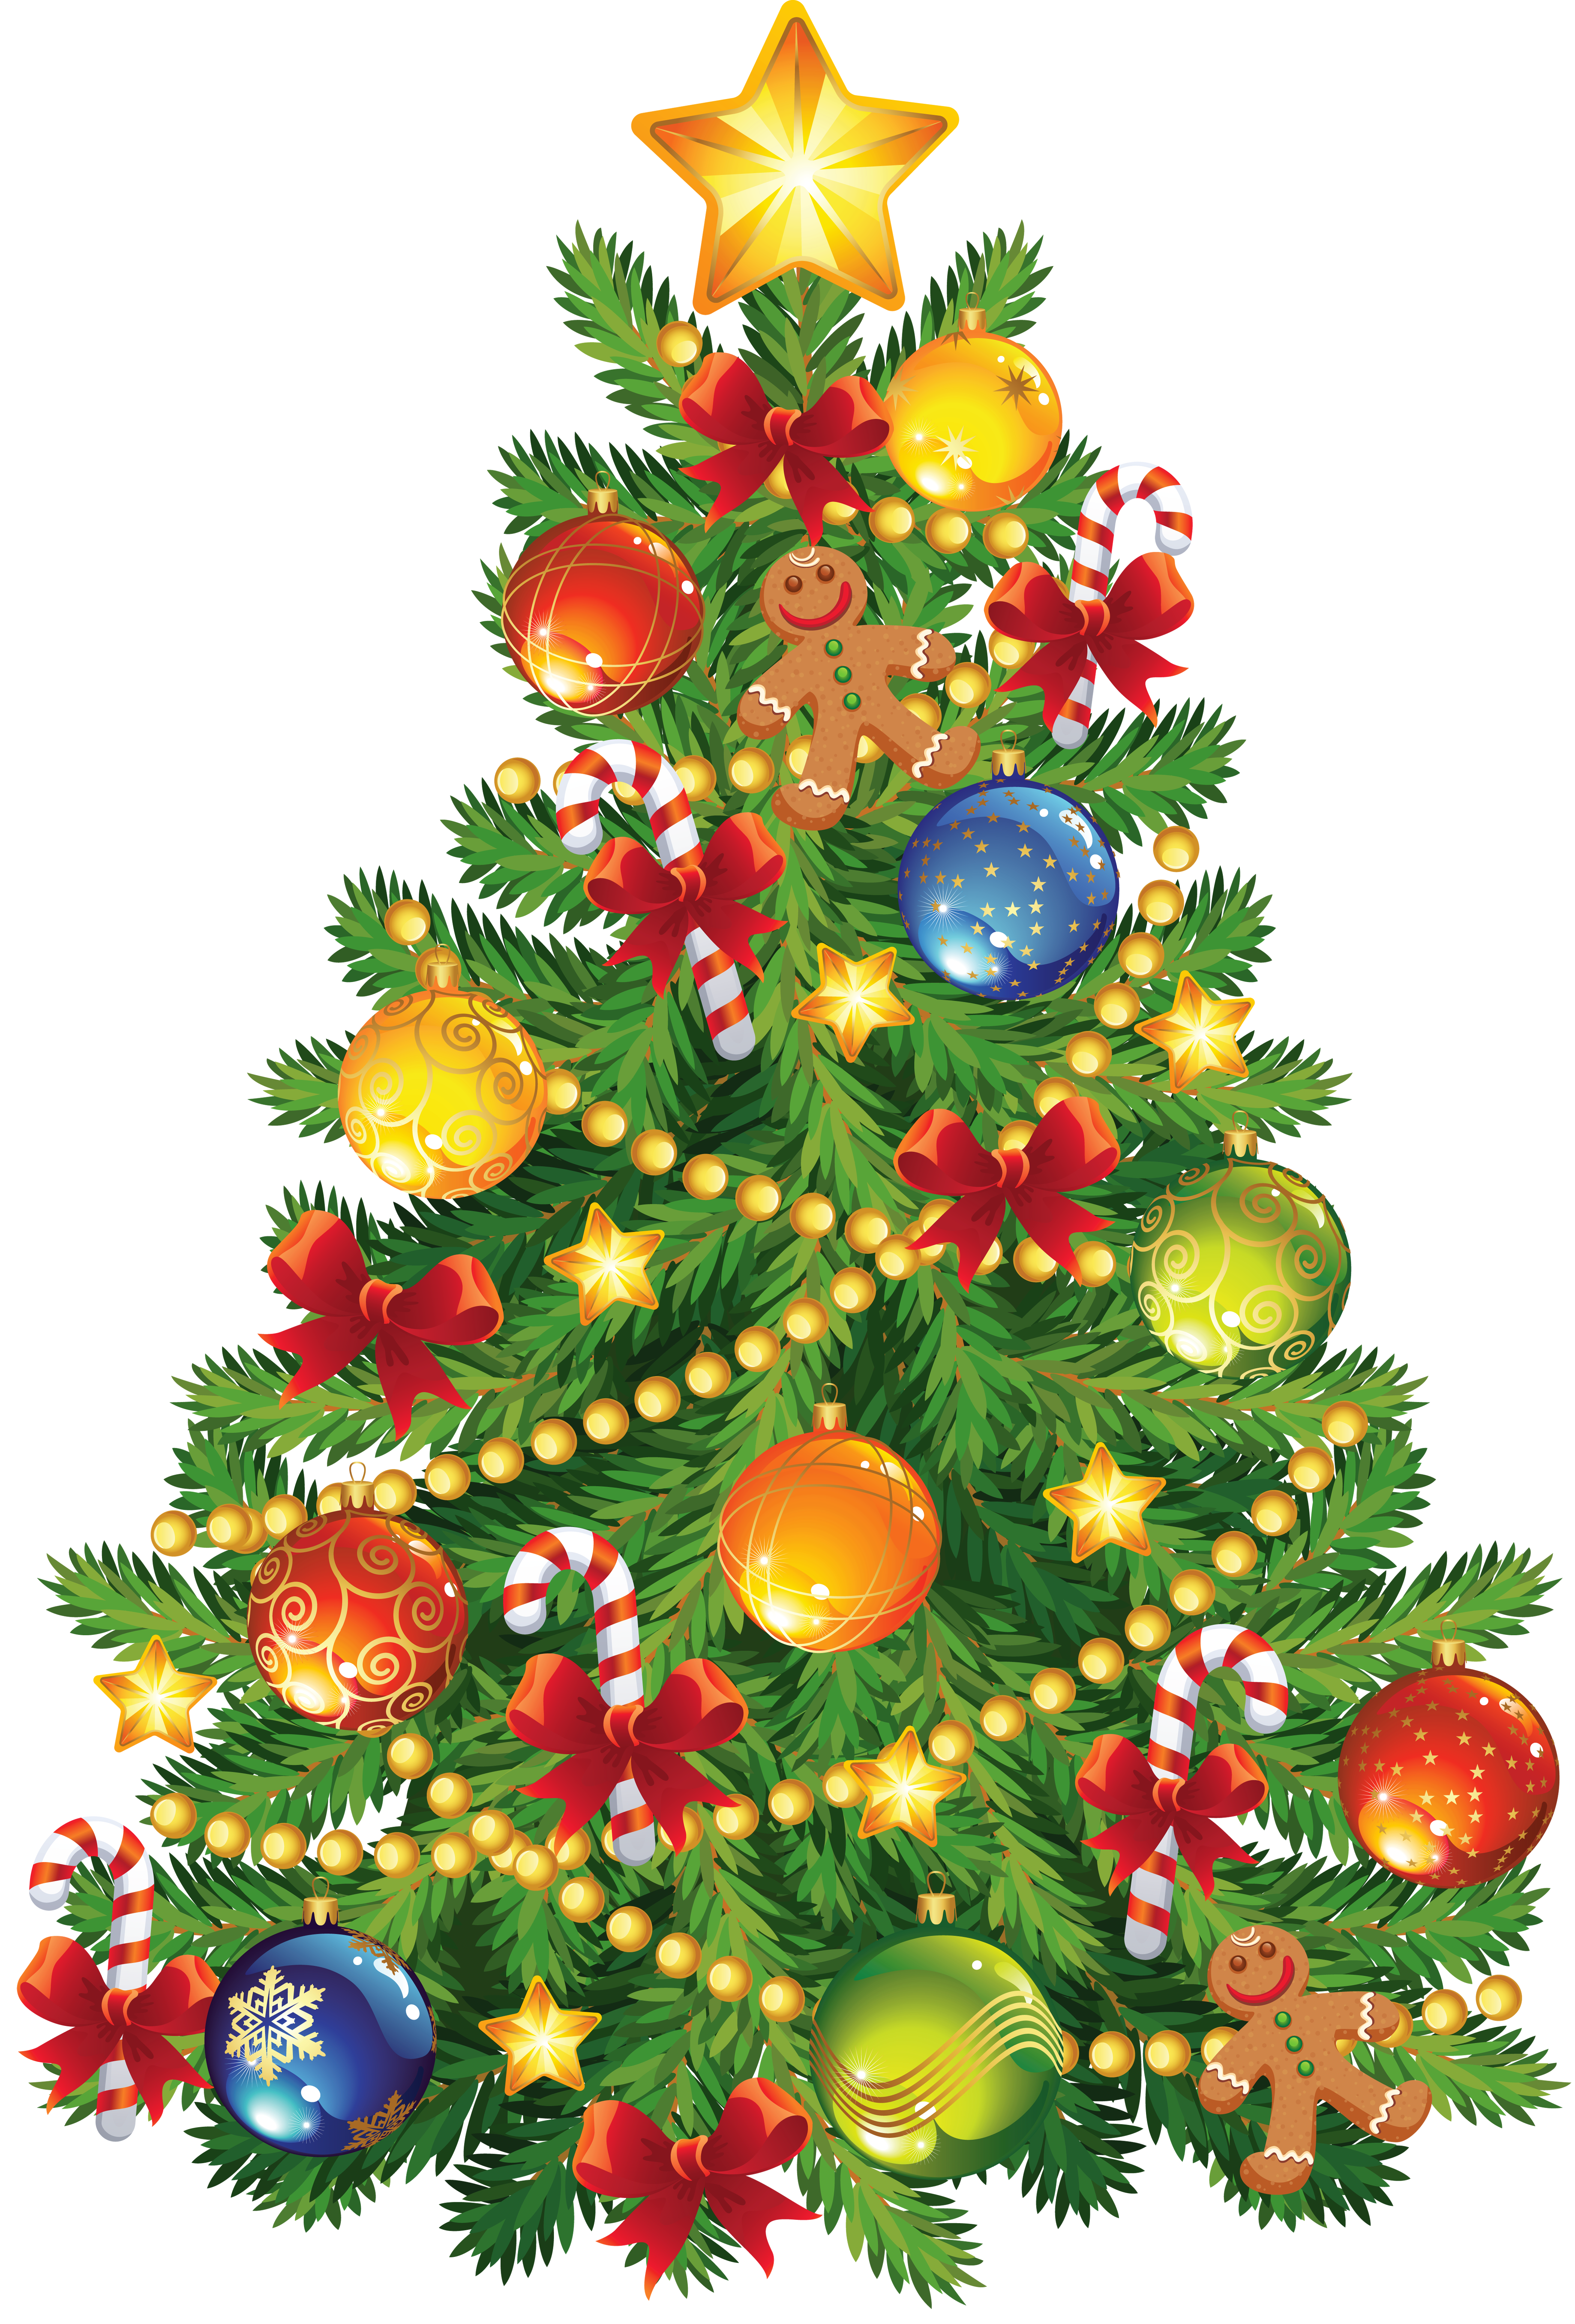 Xmas Stuff For Christmas Trees .-Xmas Stuff For Christmas Trees .-18